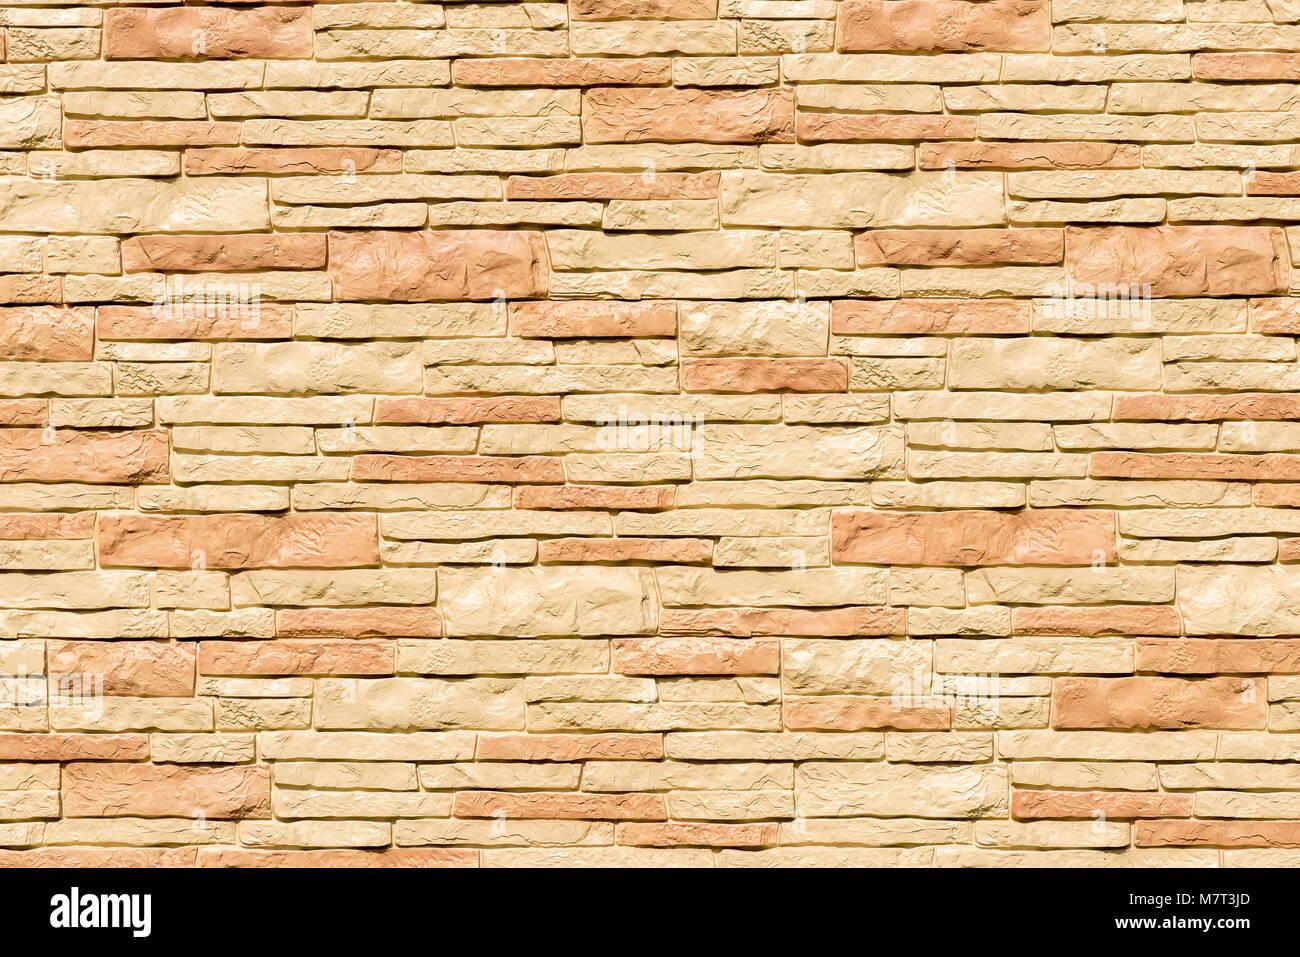 Great Decorative Brick Walls Ideas - The Wall Art Decorations ...